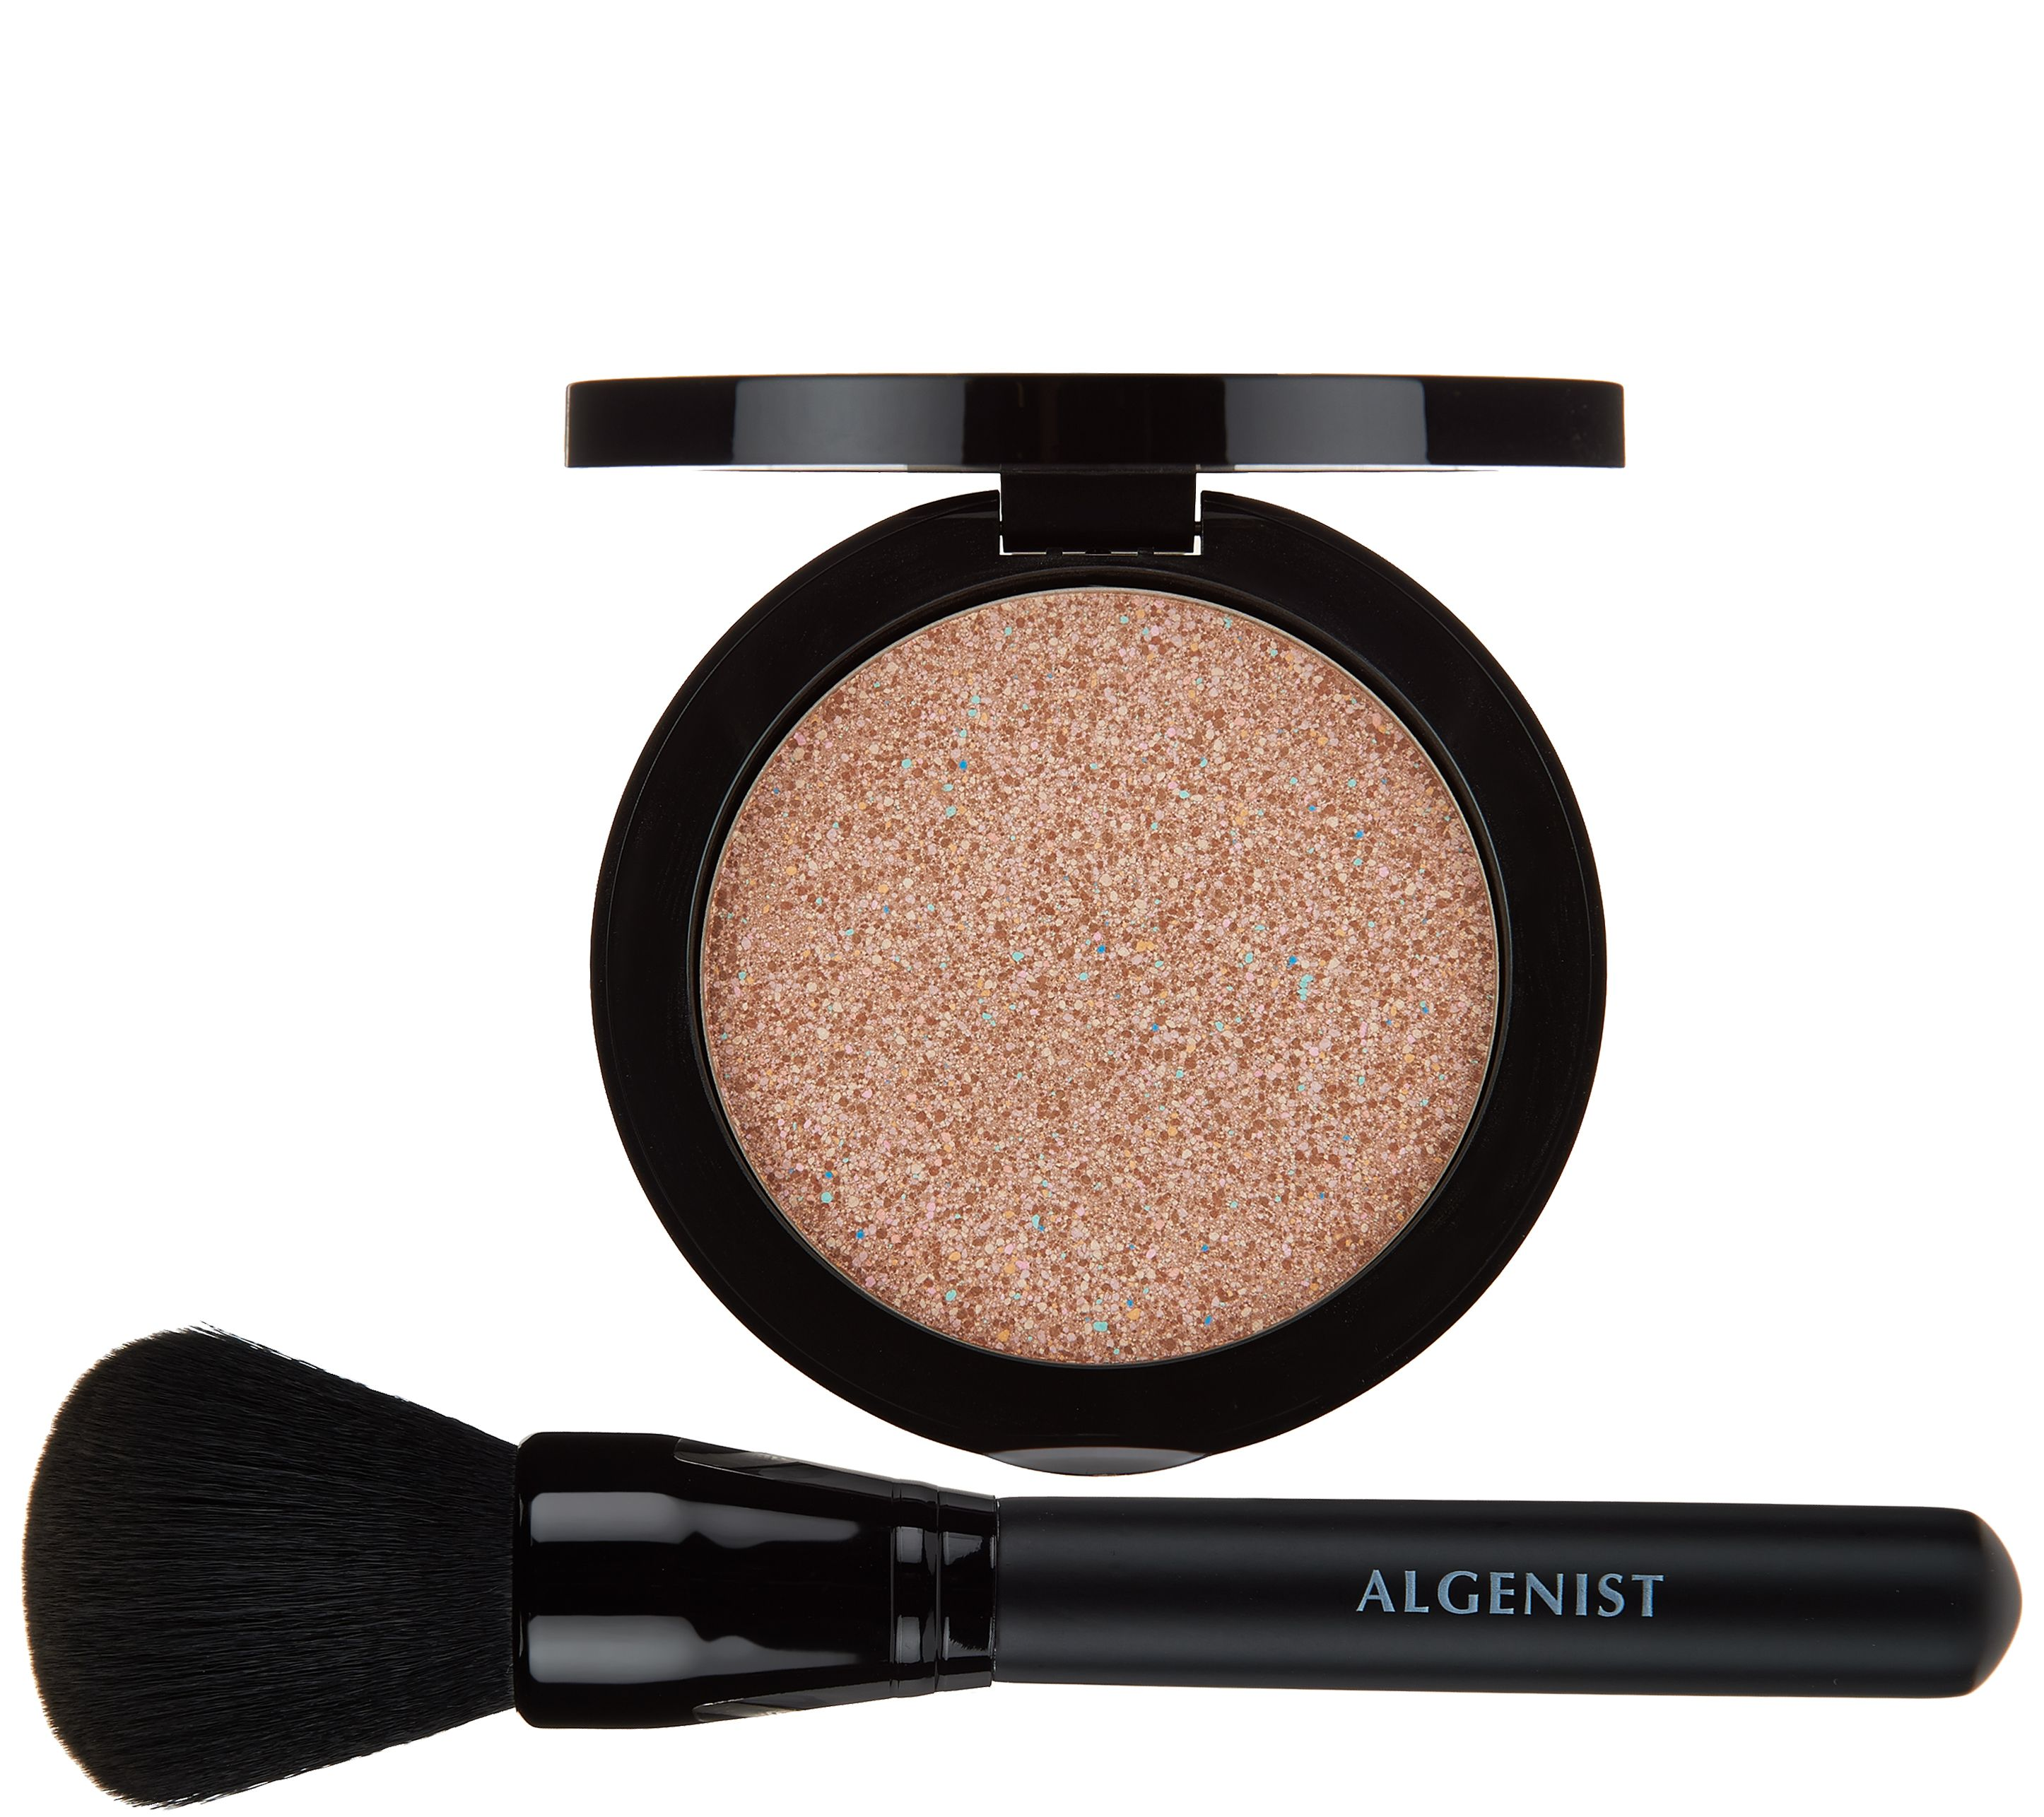 algenist powder